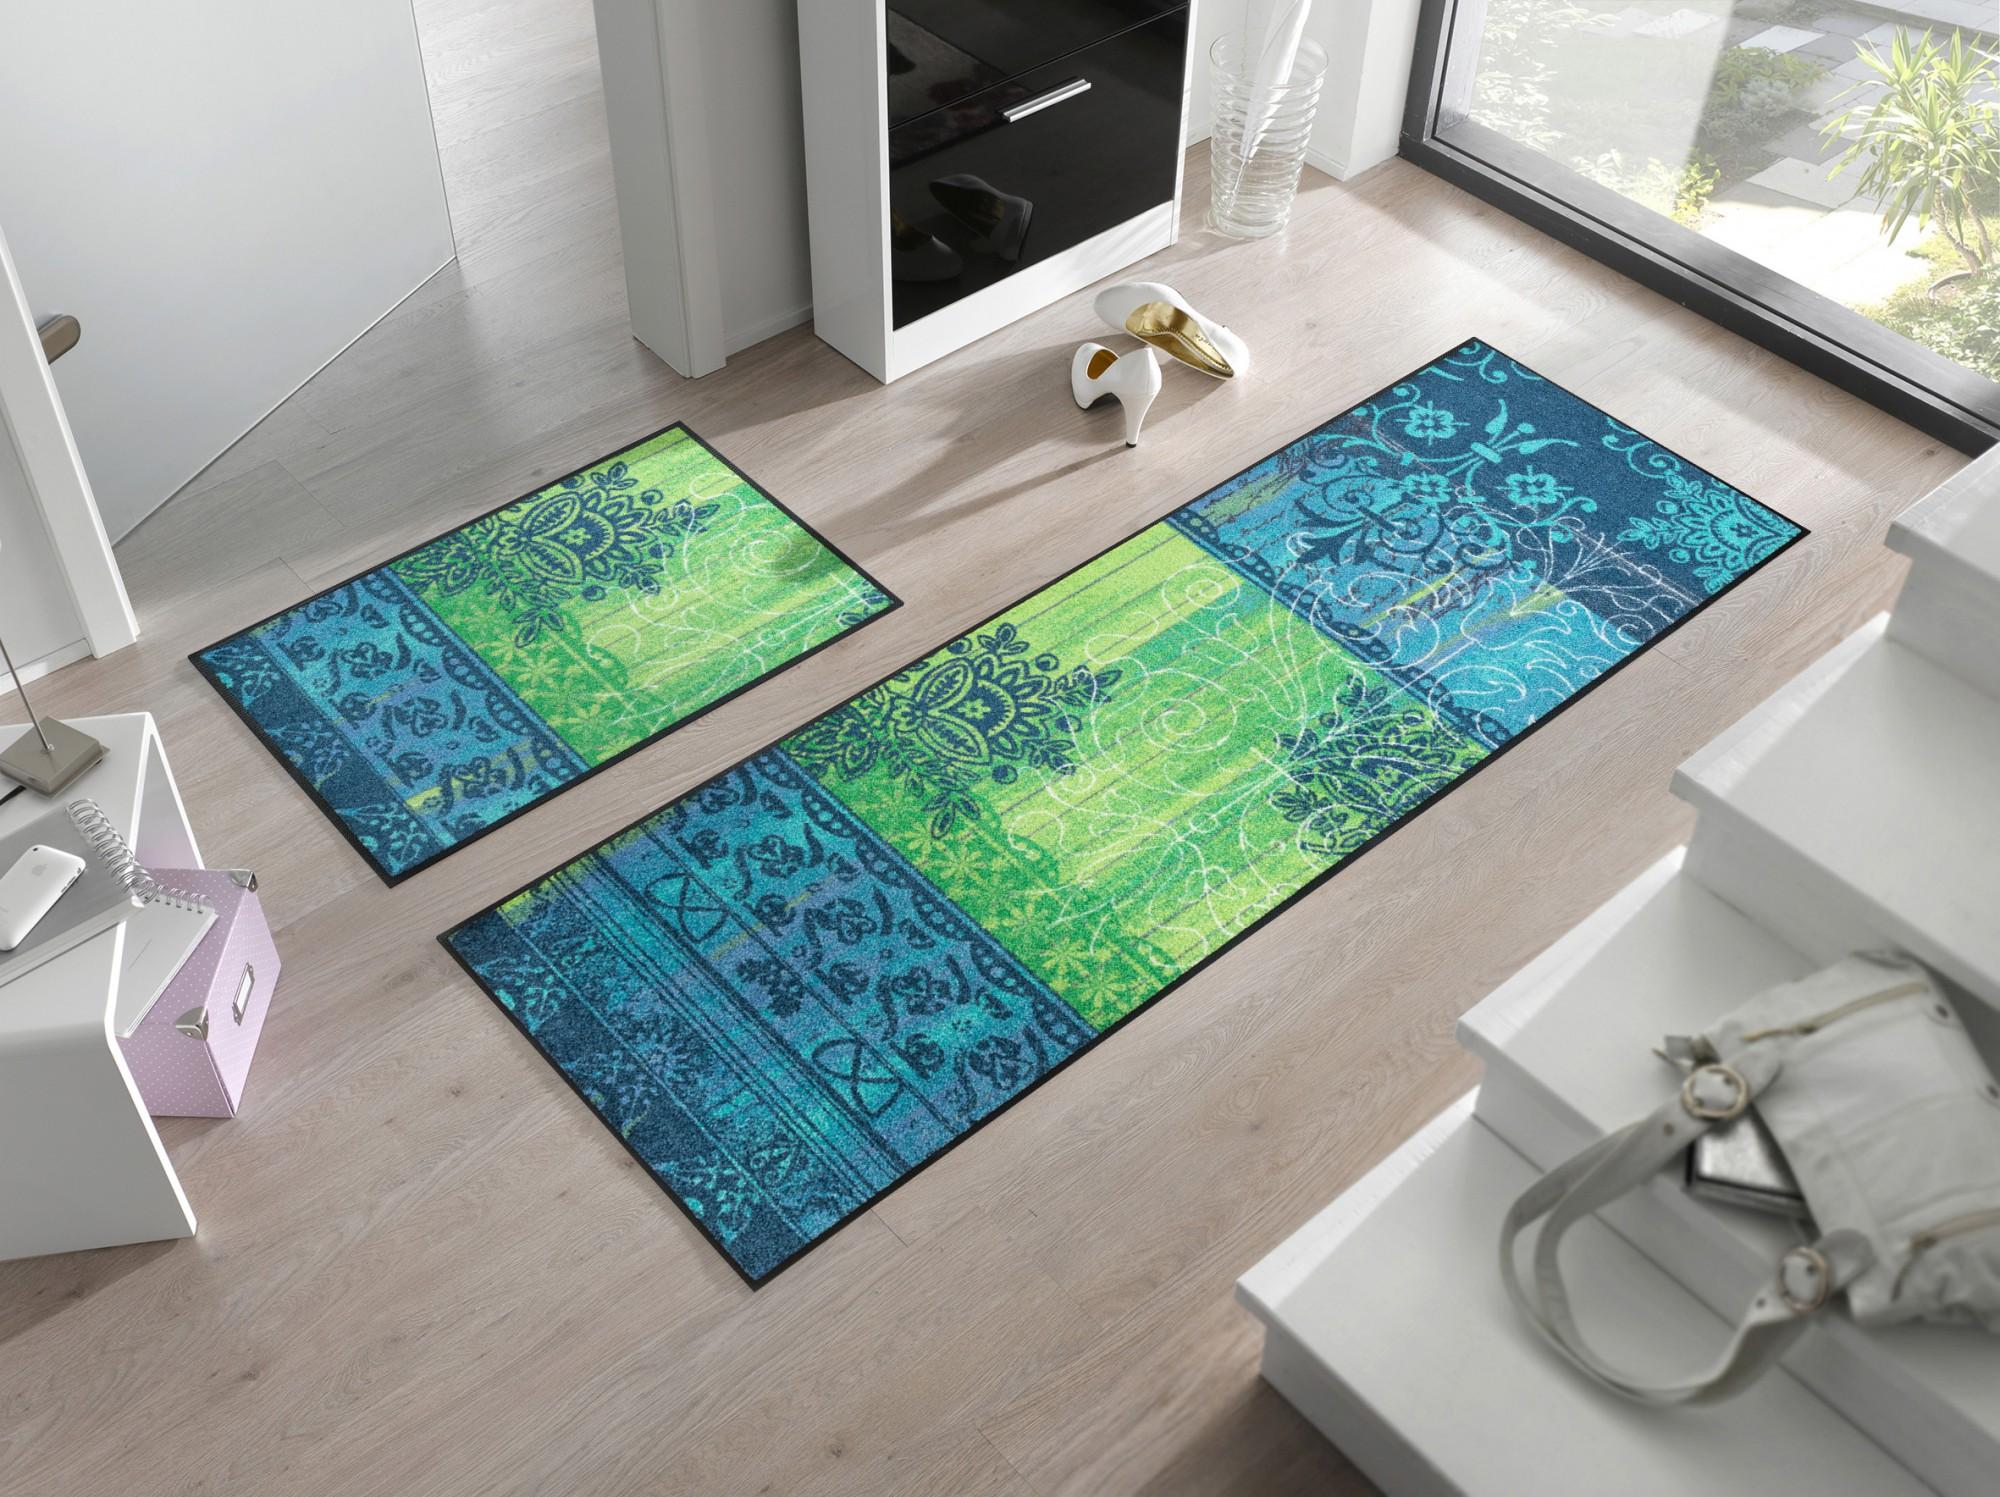 wash dry fu matte borda green waschbare fu matte. Black Bedroom Furniture Sets. Home Design Ideas